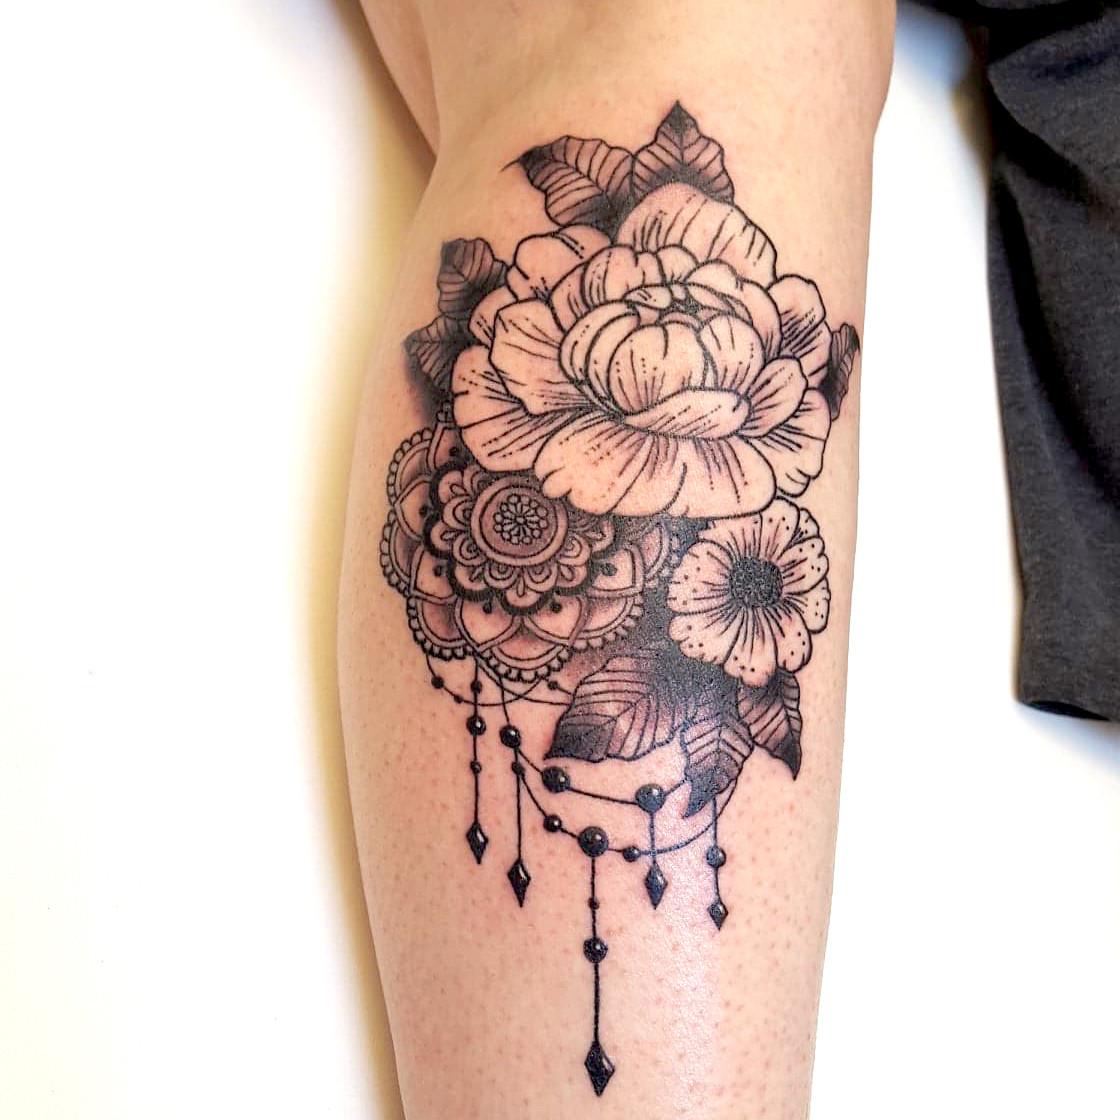 Mandala And Flower Tattoo: Tattoo Studio Manchester